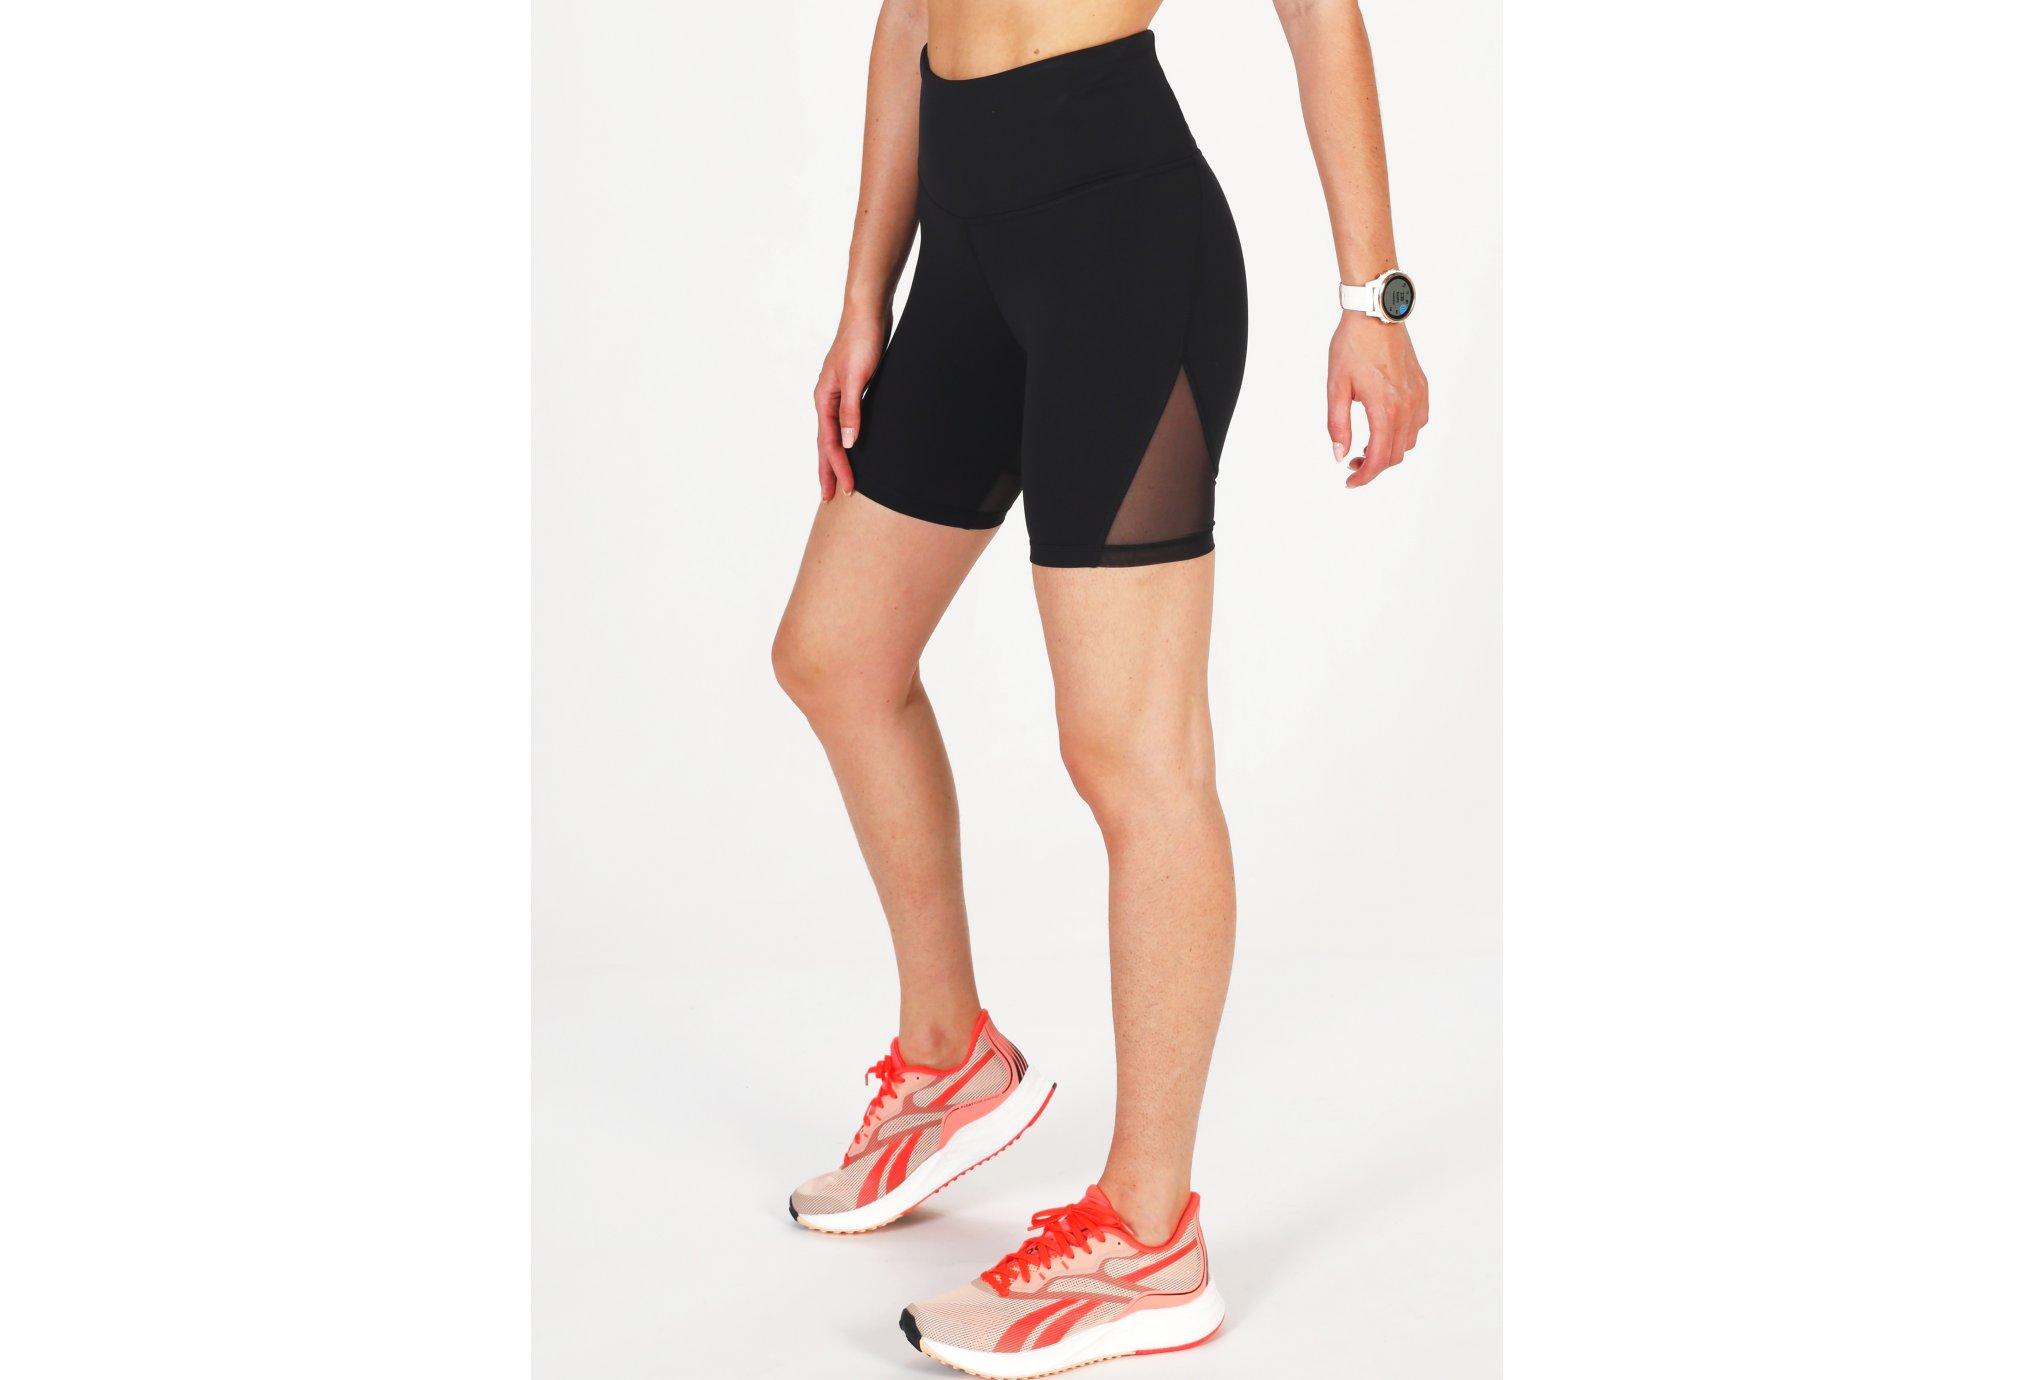 Reebok Beyond The Sweat Bike W vêtement running femme